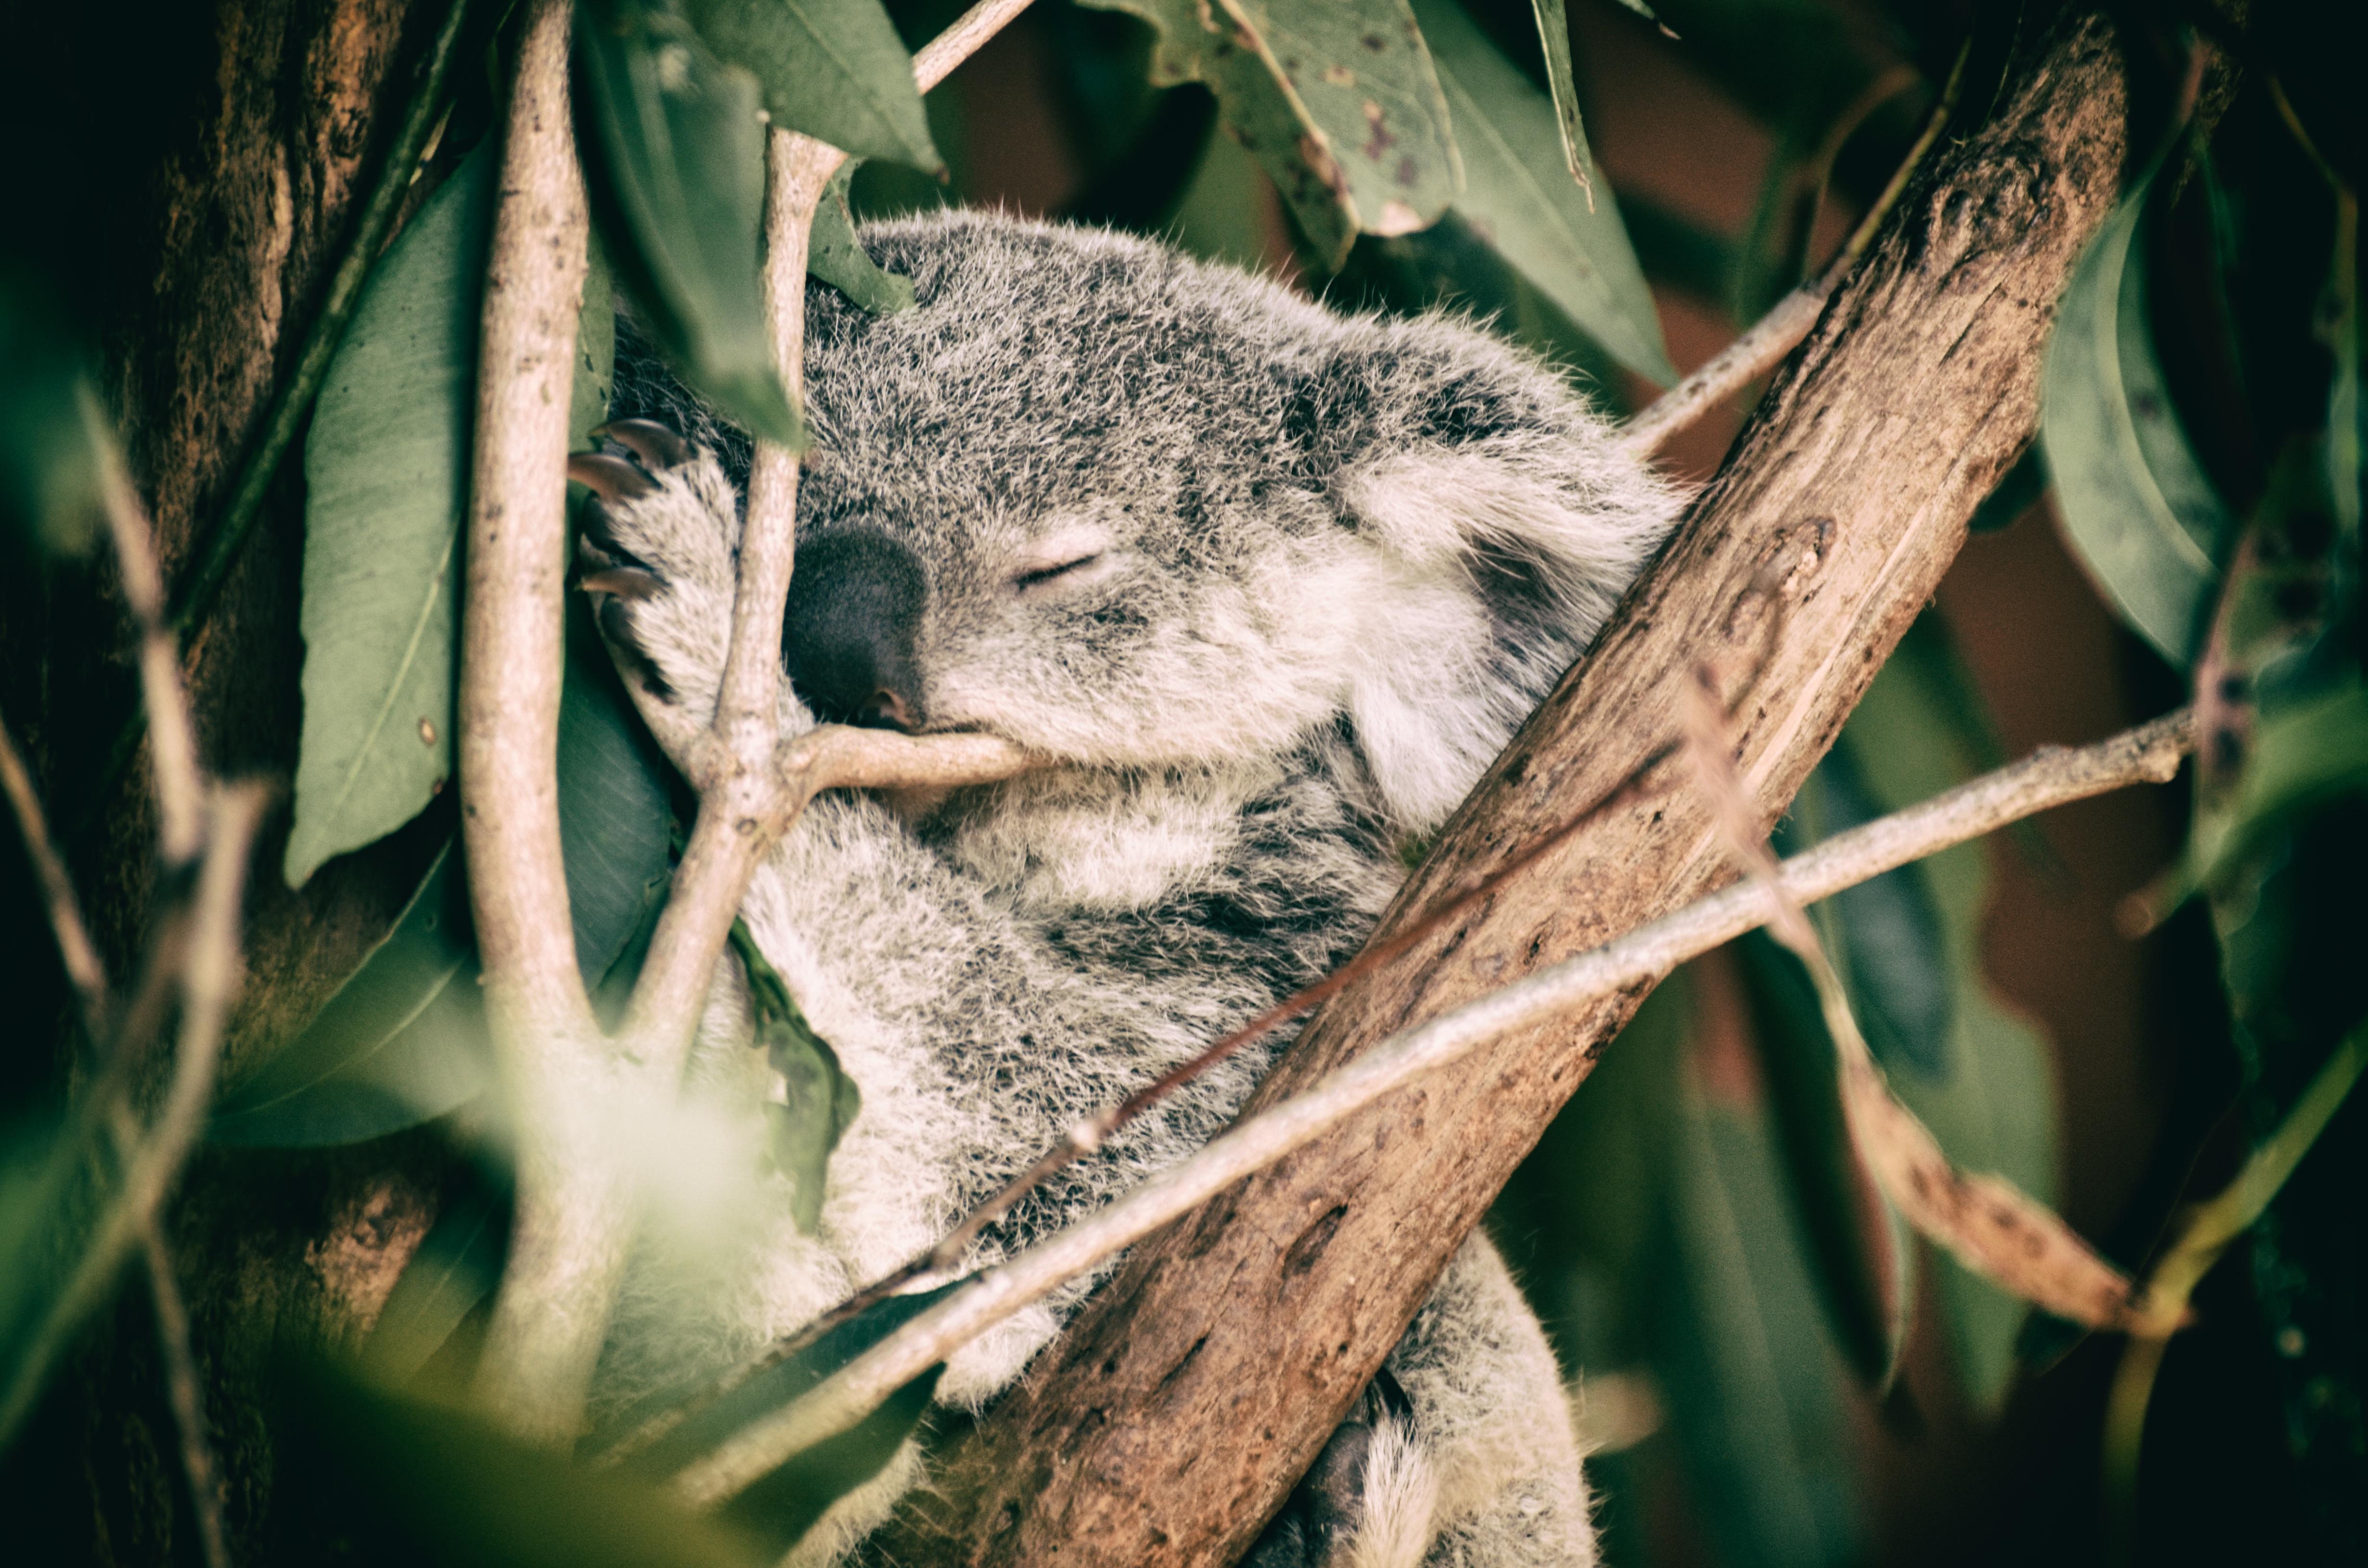 Baby Koala in Australia